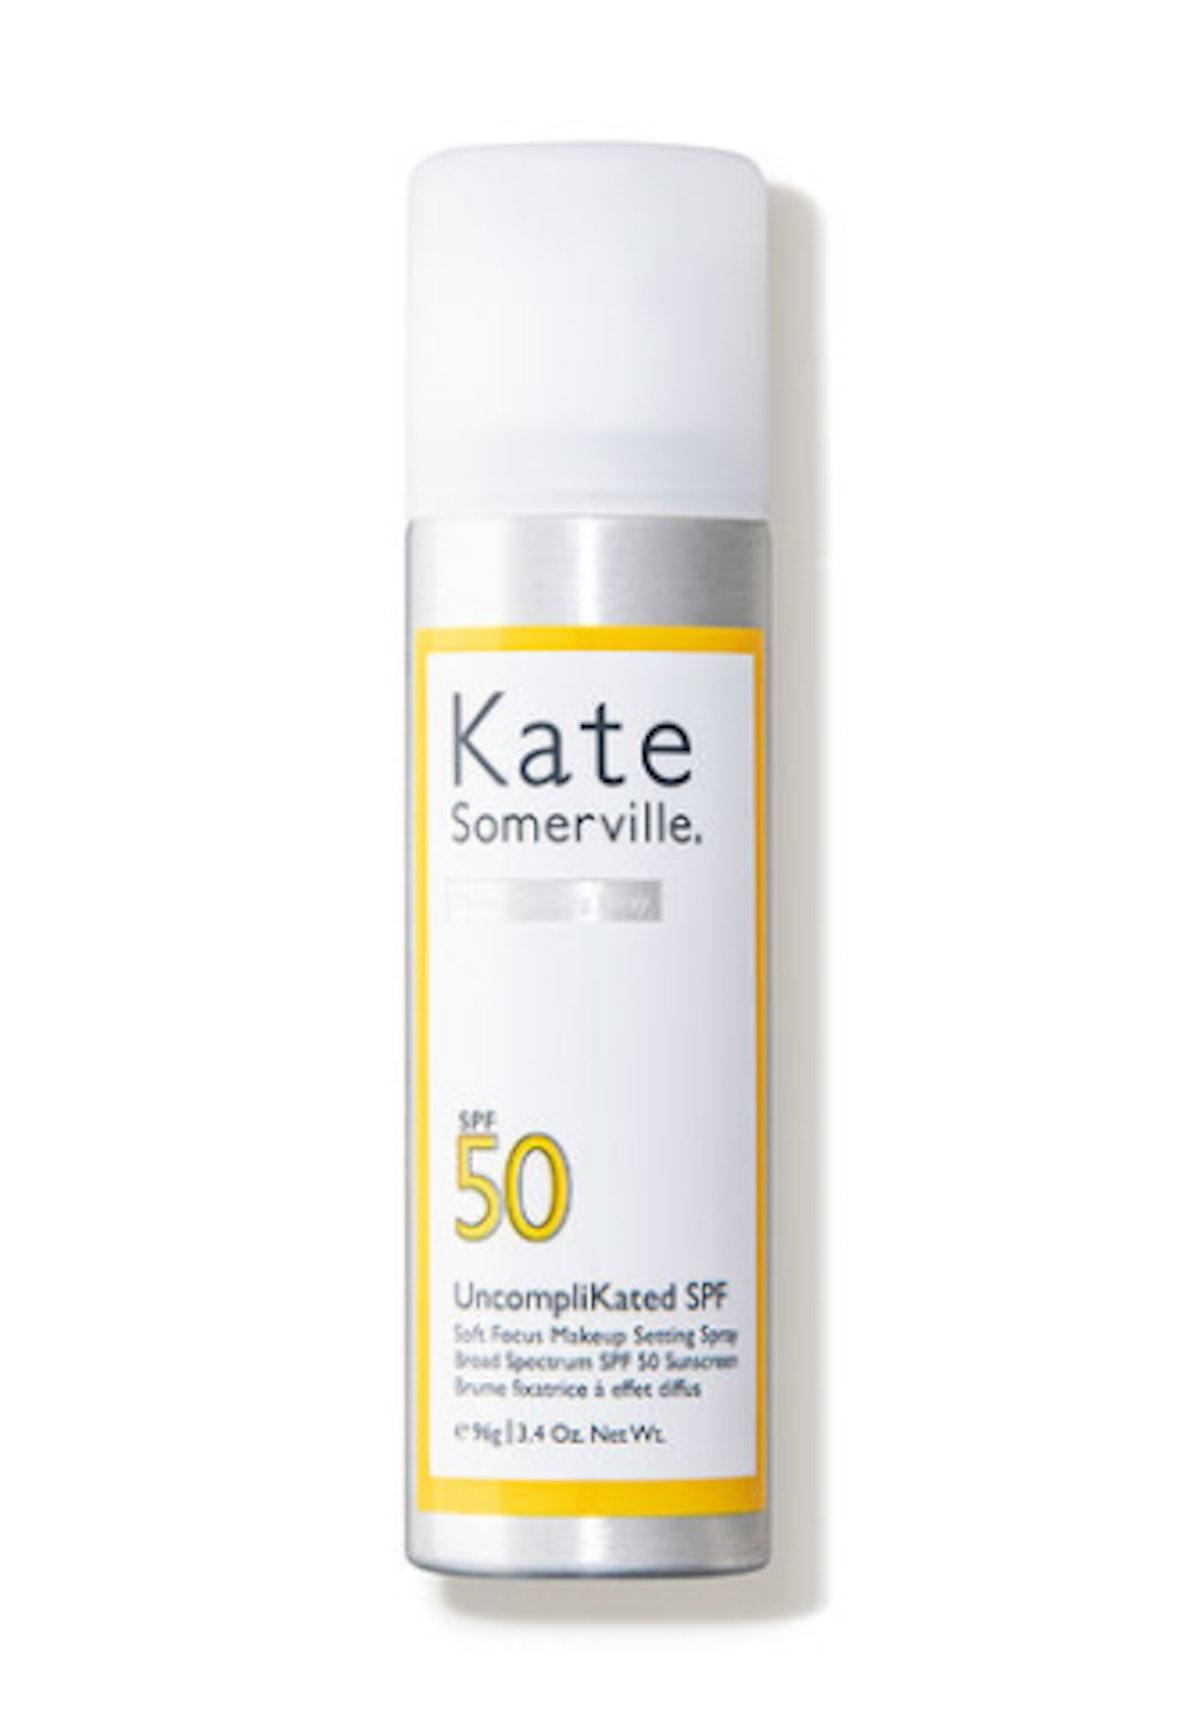 UncompliKated SPF Soft Focus Makeup Setting Spray Broad Spectrum SPF 50 Sunscreen